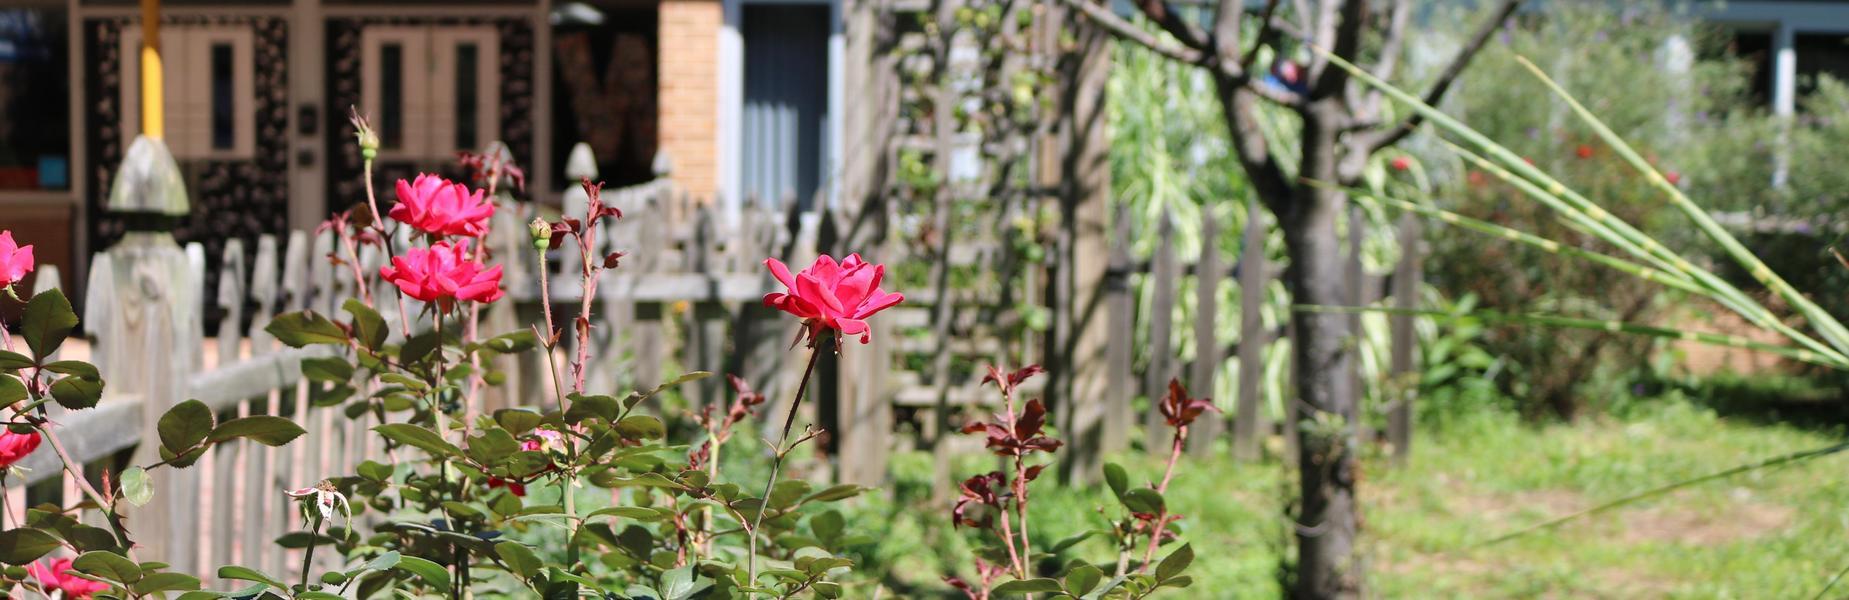 Photo of roses in Washington School garden